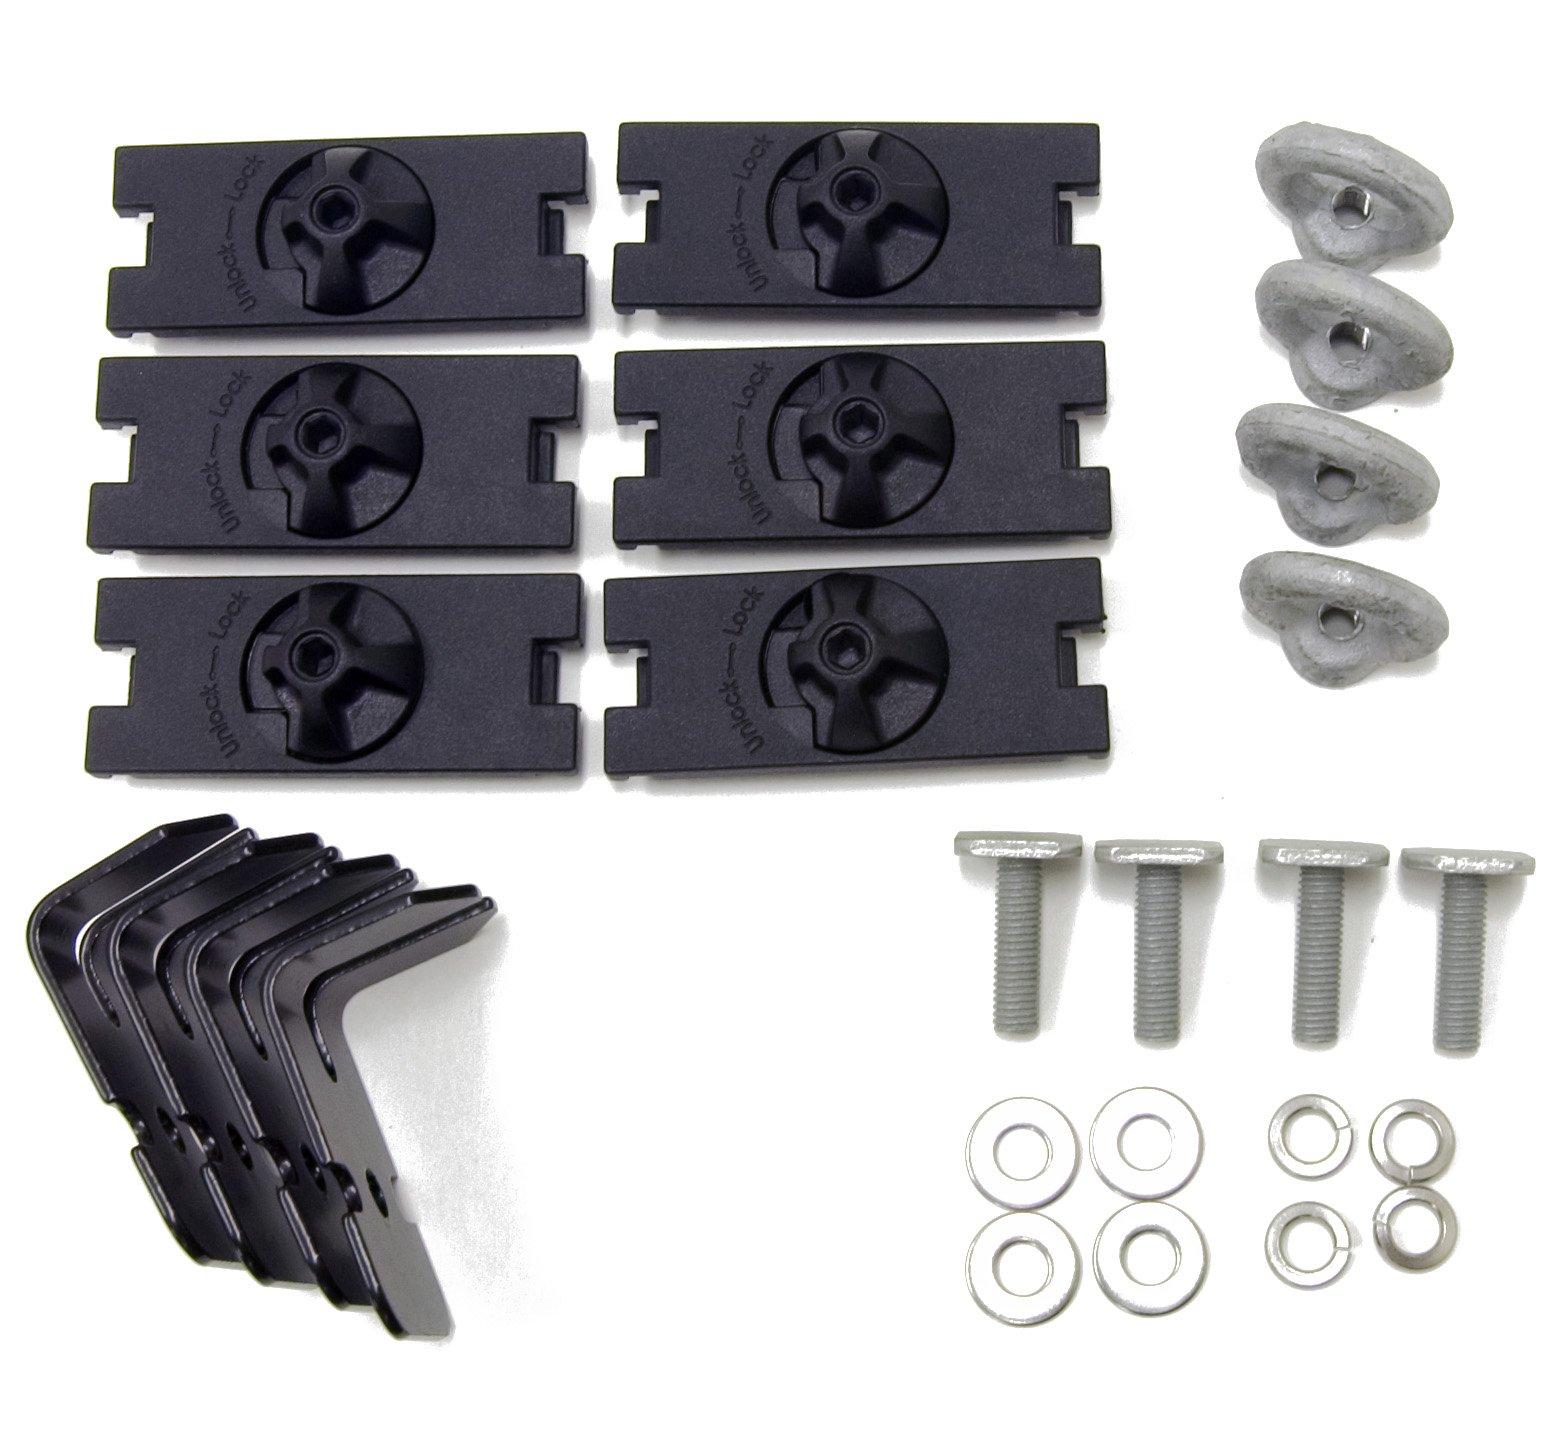 Rhino Rack Alloy Tray Aero Fitting Kit (Fits 2 Cross Bars and 4 Planks)